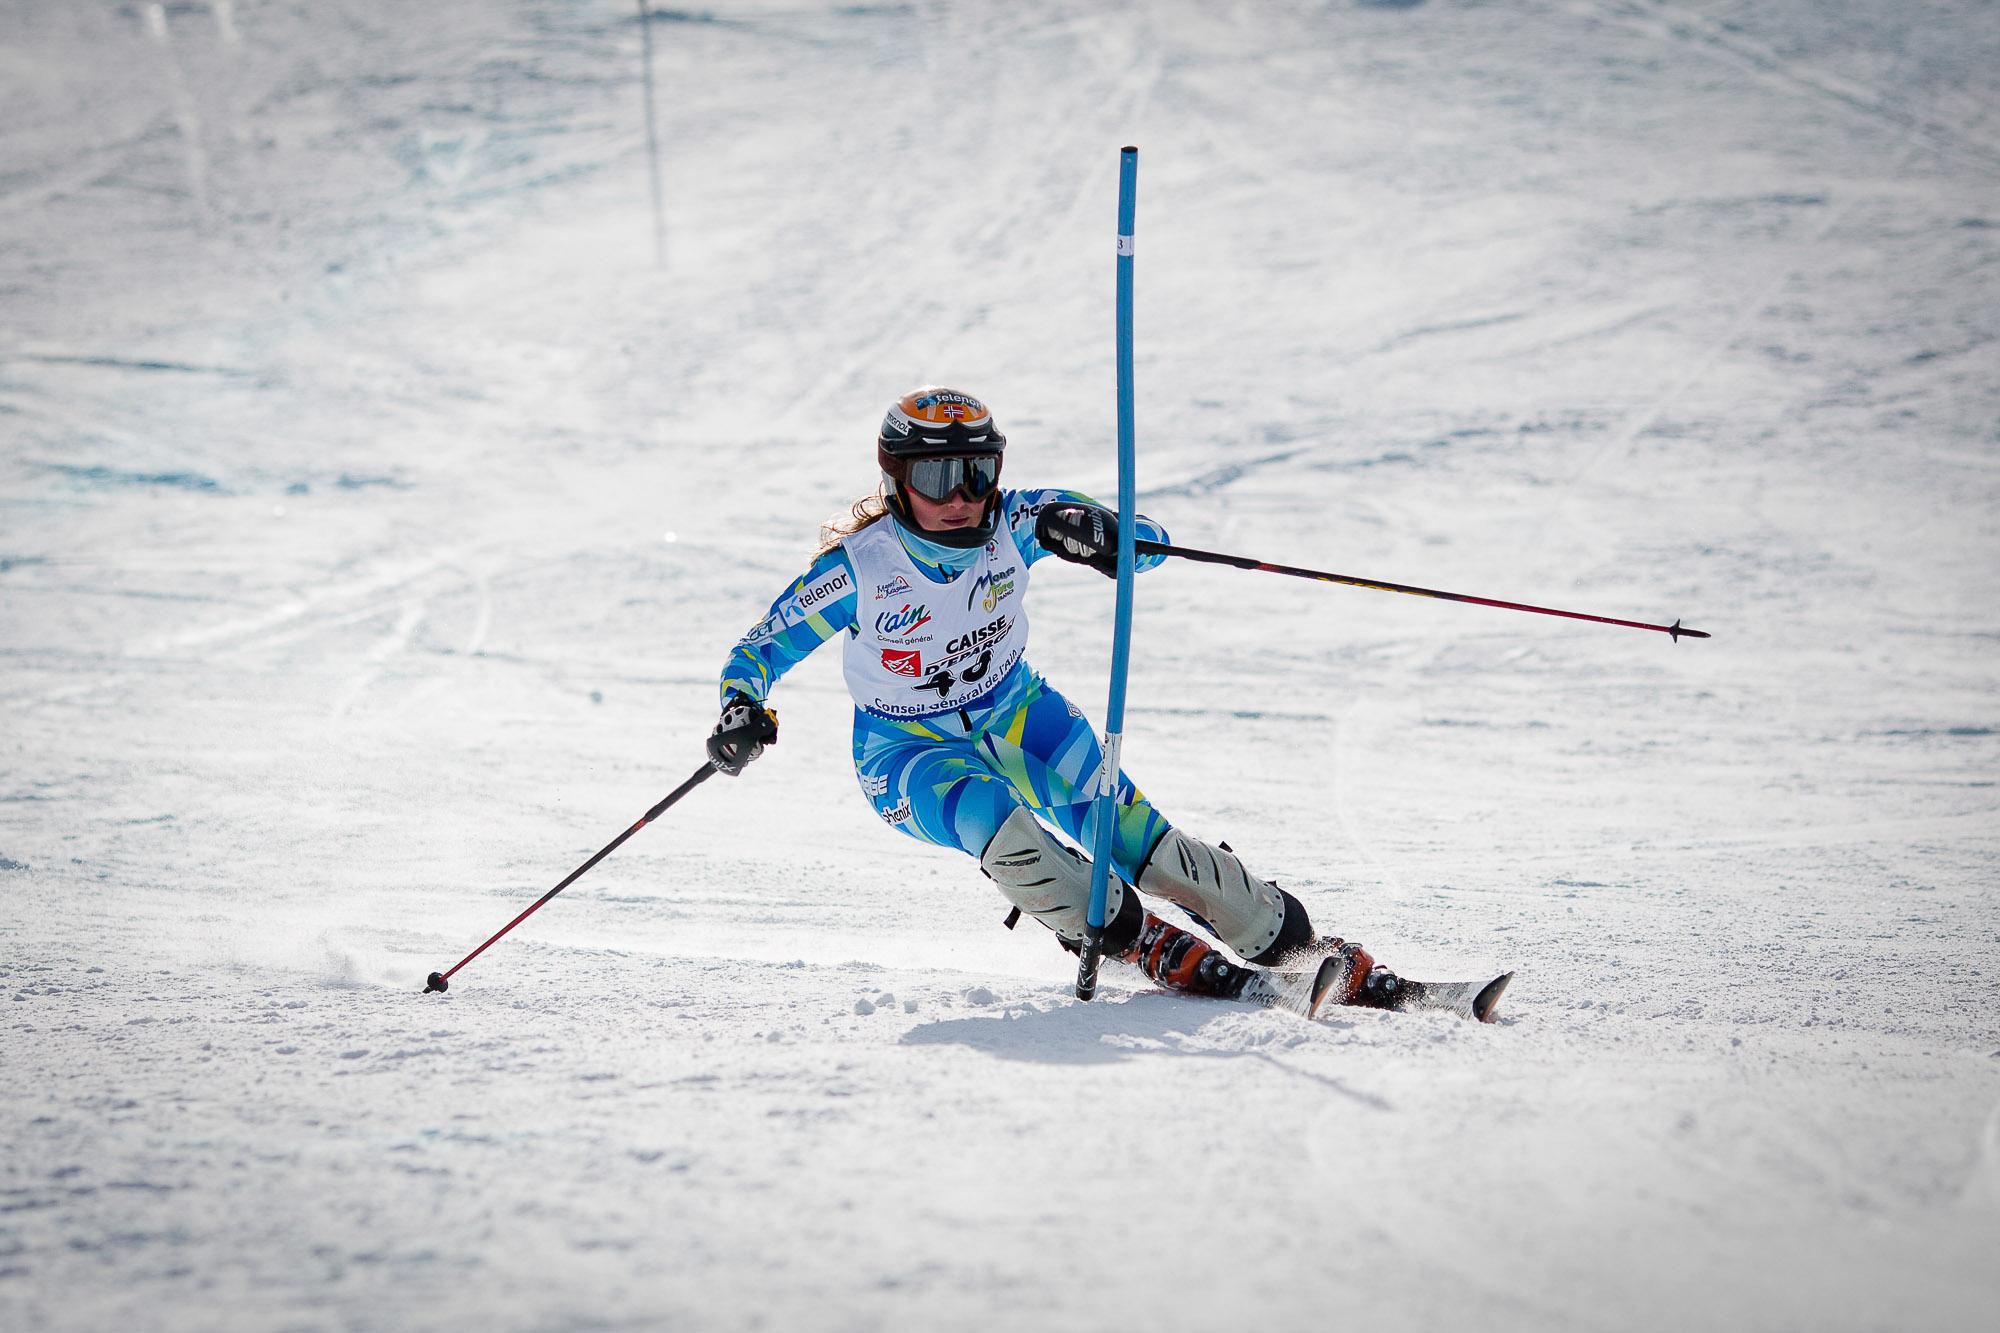 Coupe_Europe_ski_dames-360.jpg